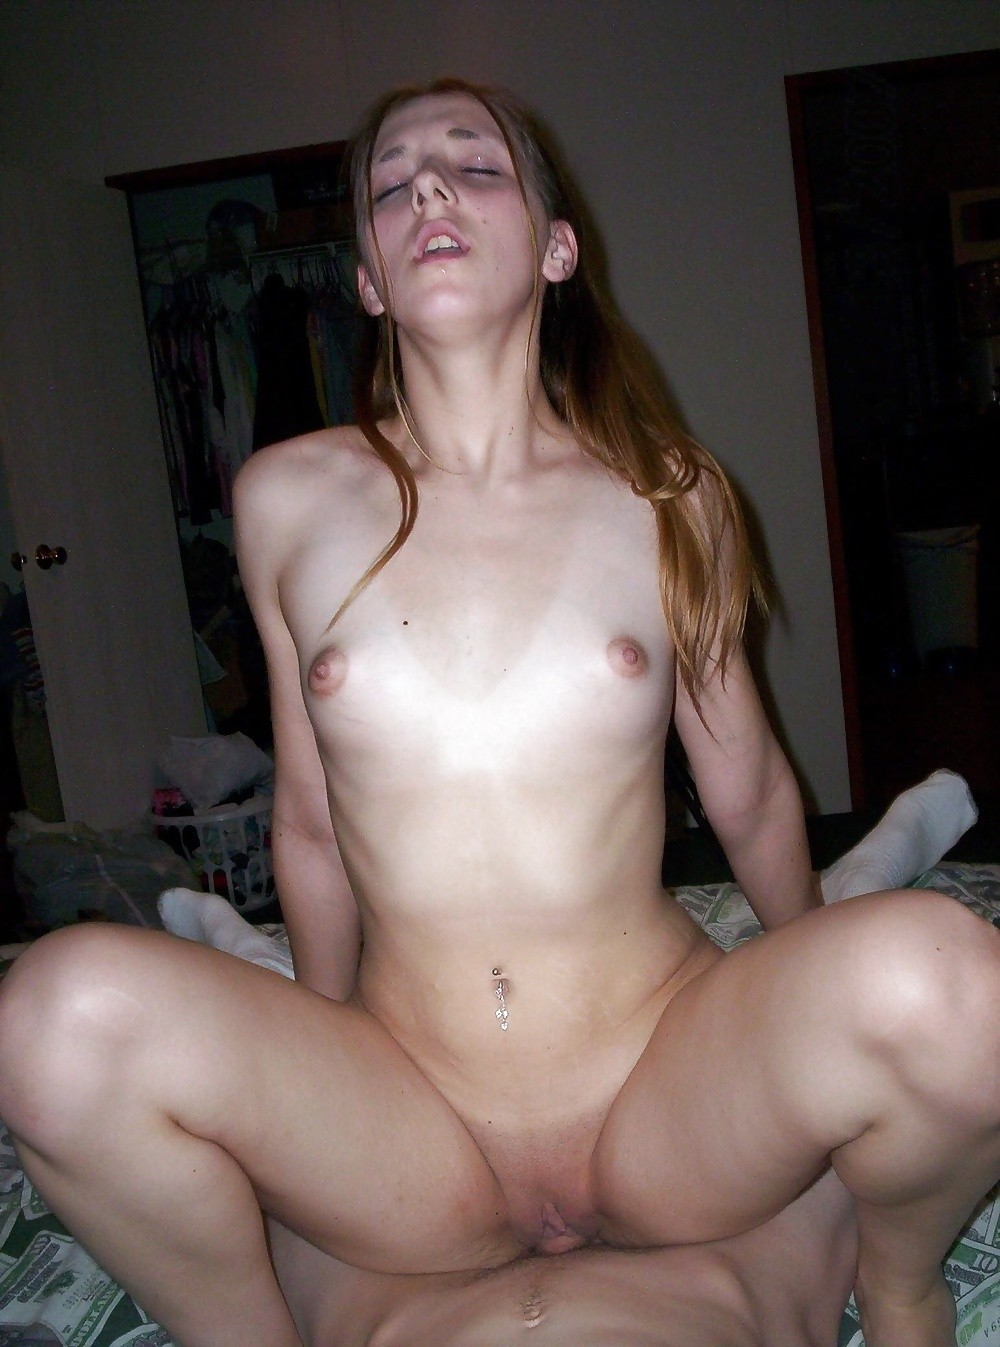 She likes my cock and masturbate on my pics 6